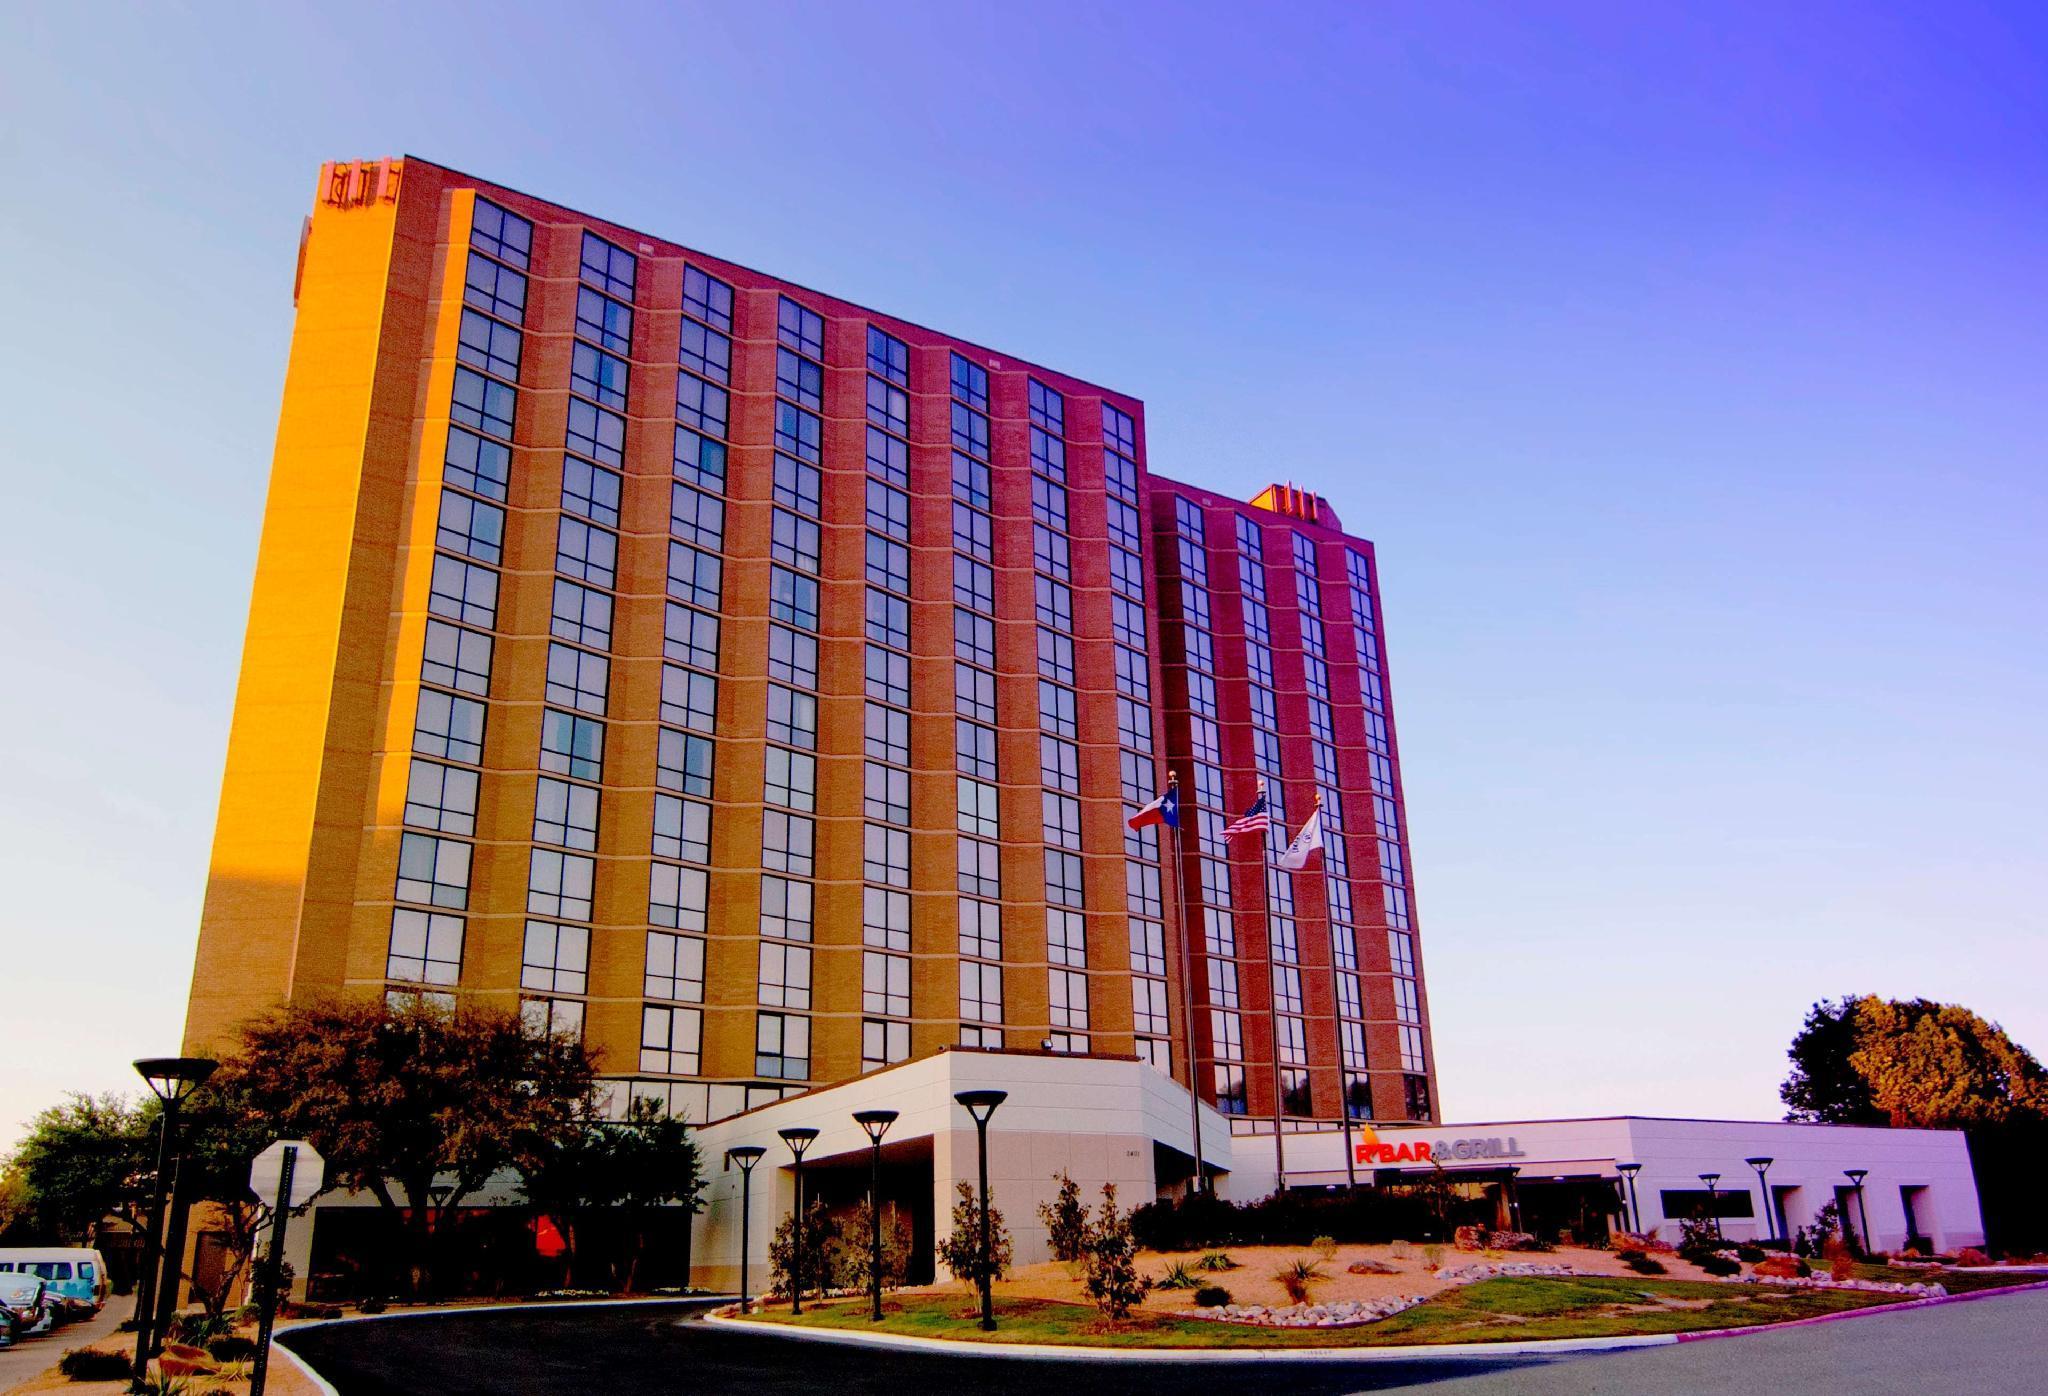 Hilton Arlington Hotel image